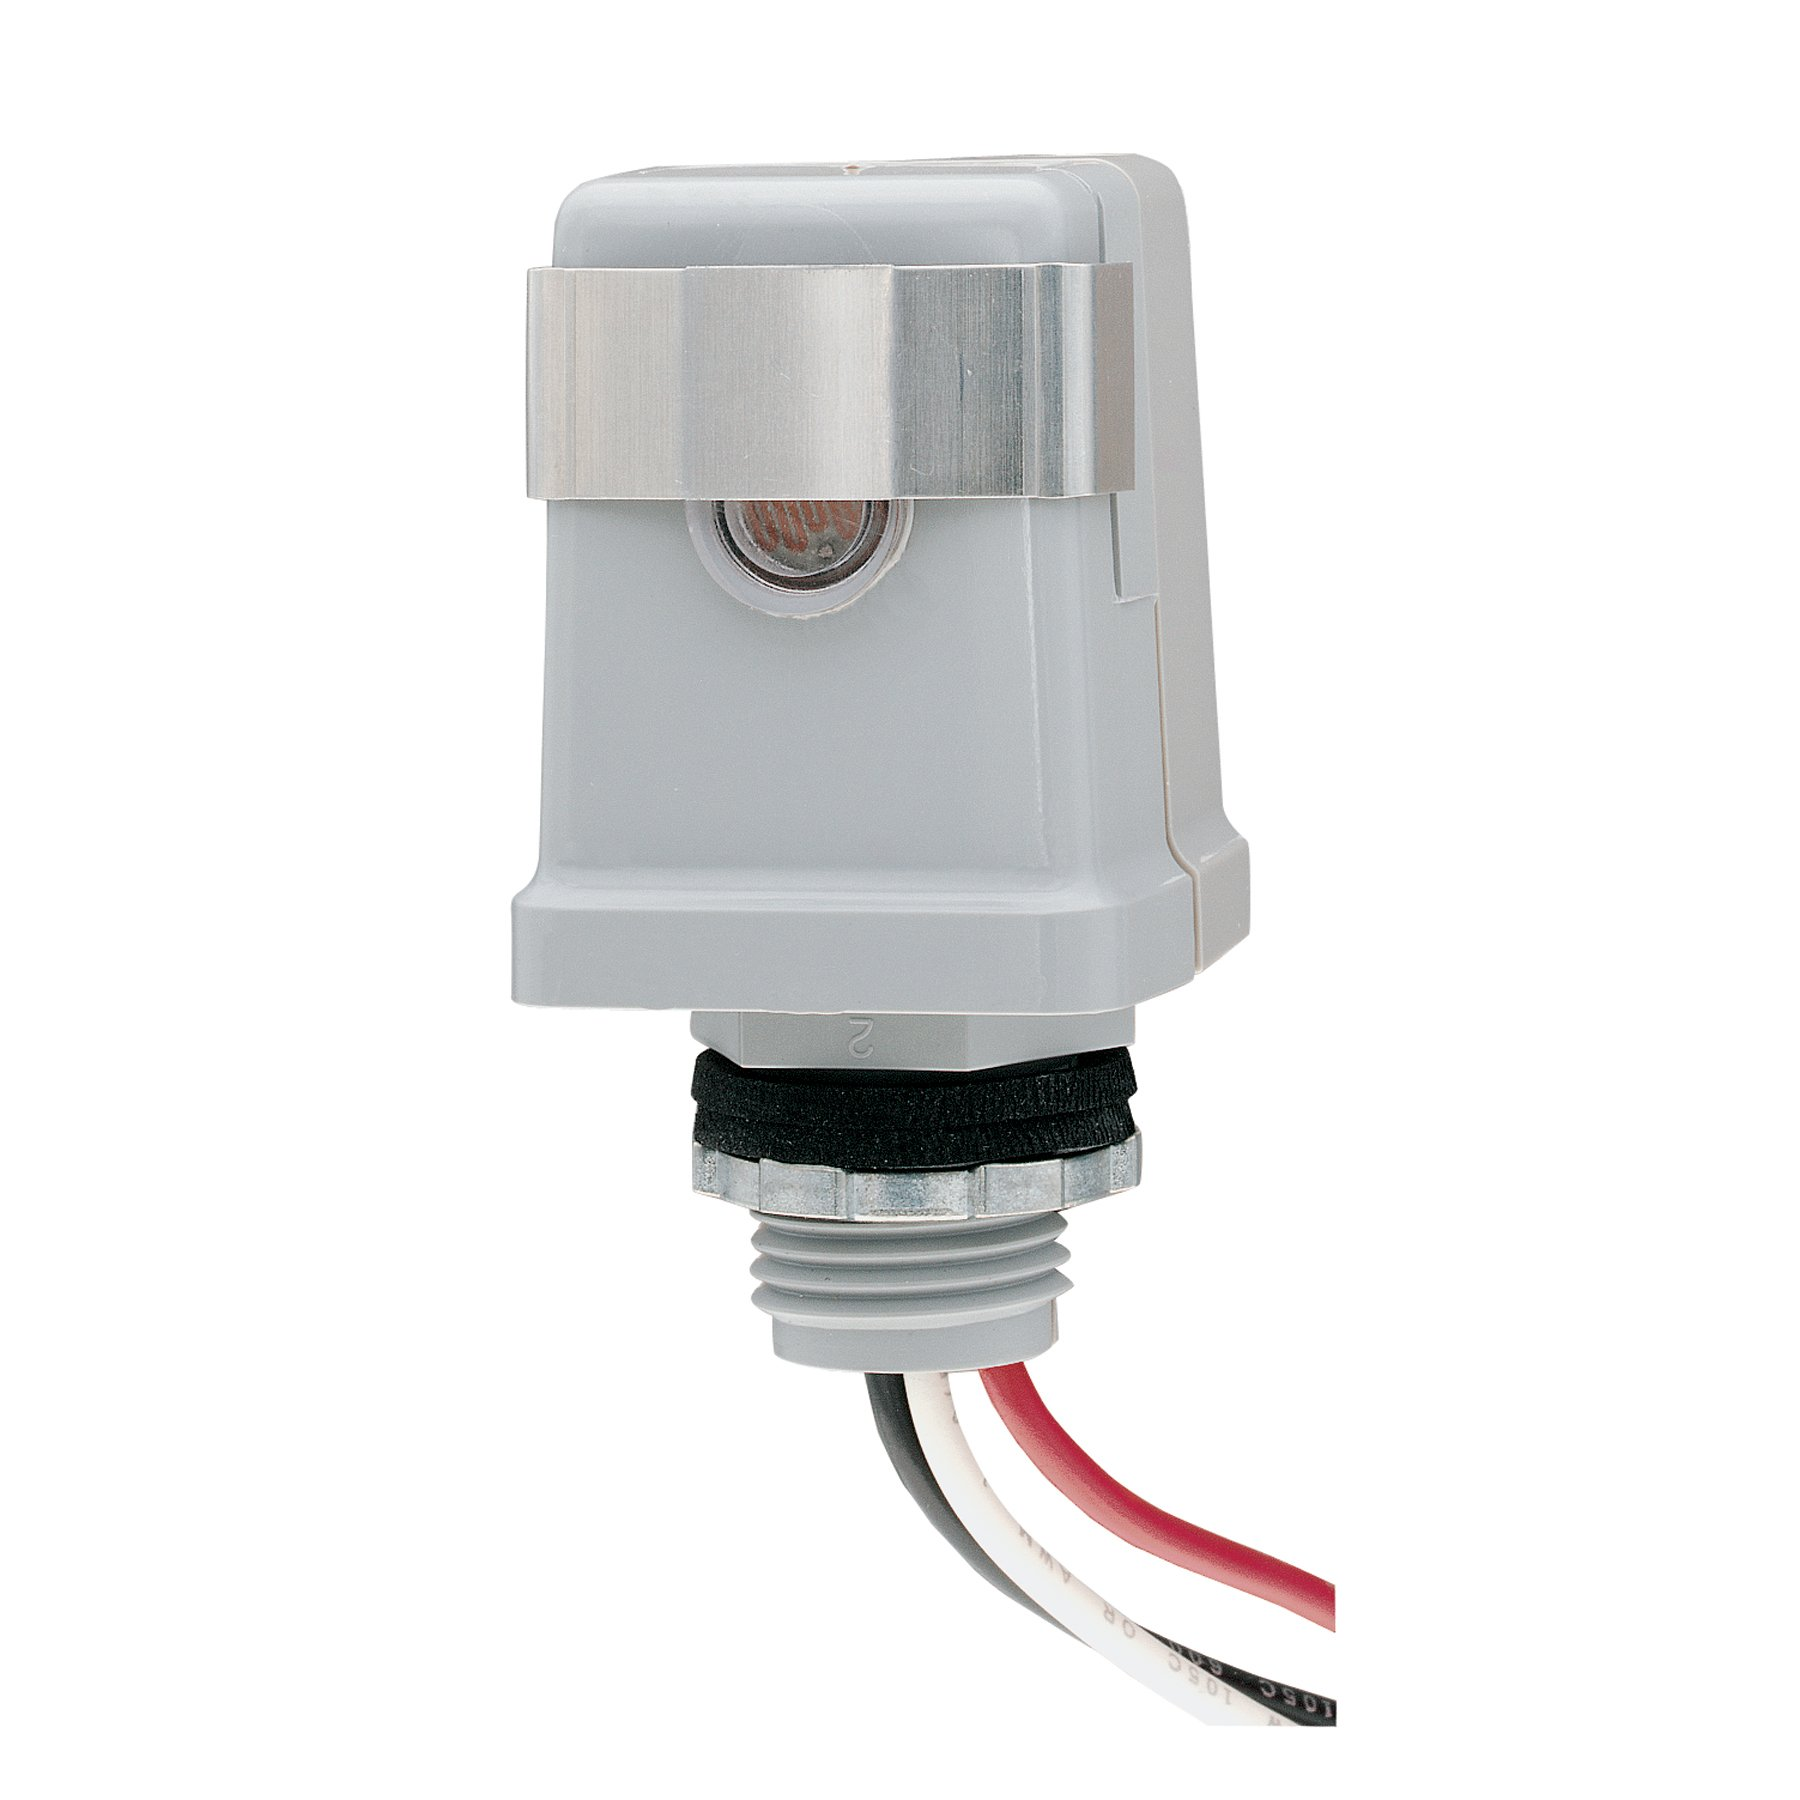 Intermatic K4141C 120-Volt 25-Amp Stem Mount Thermal Photocontrol